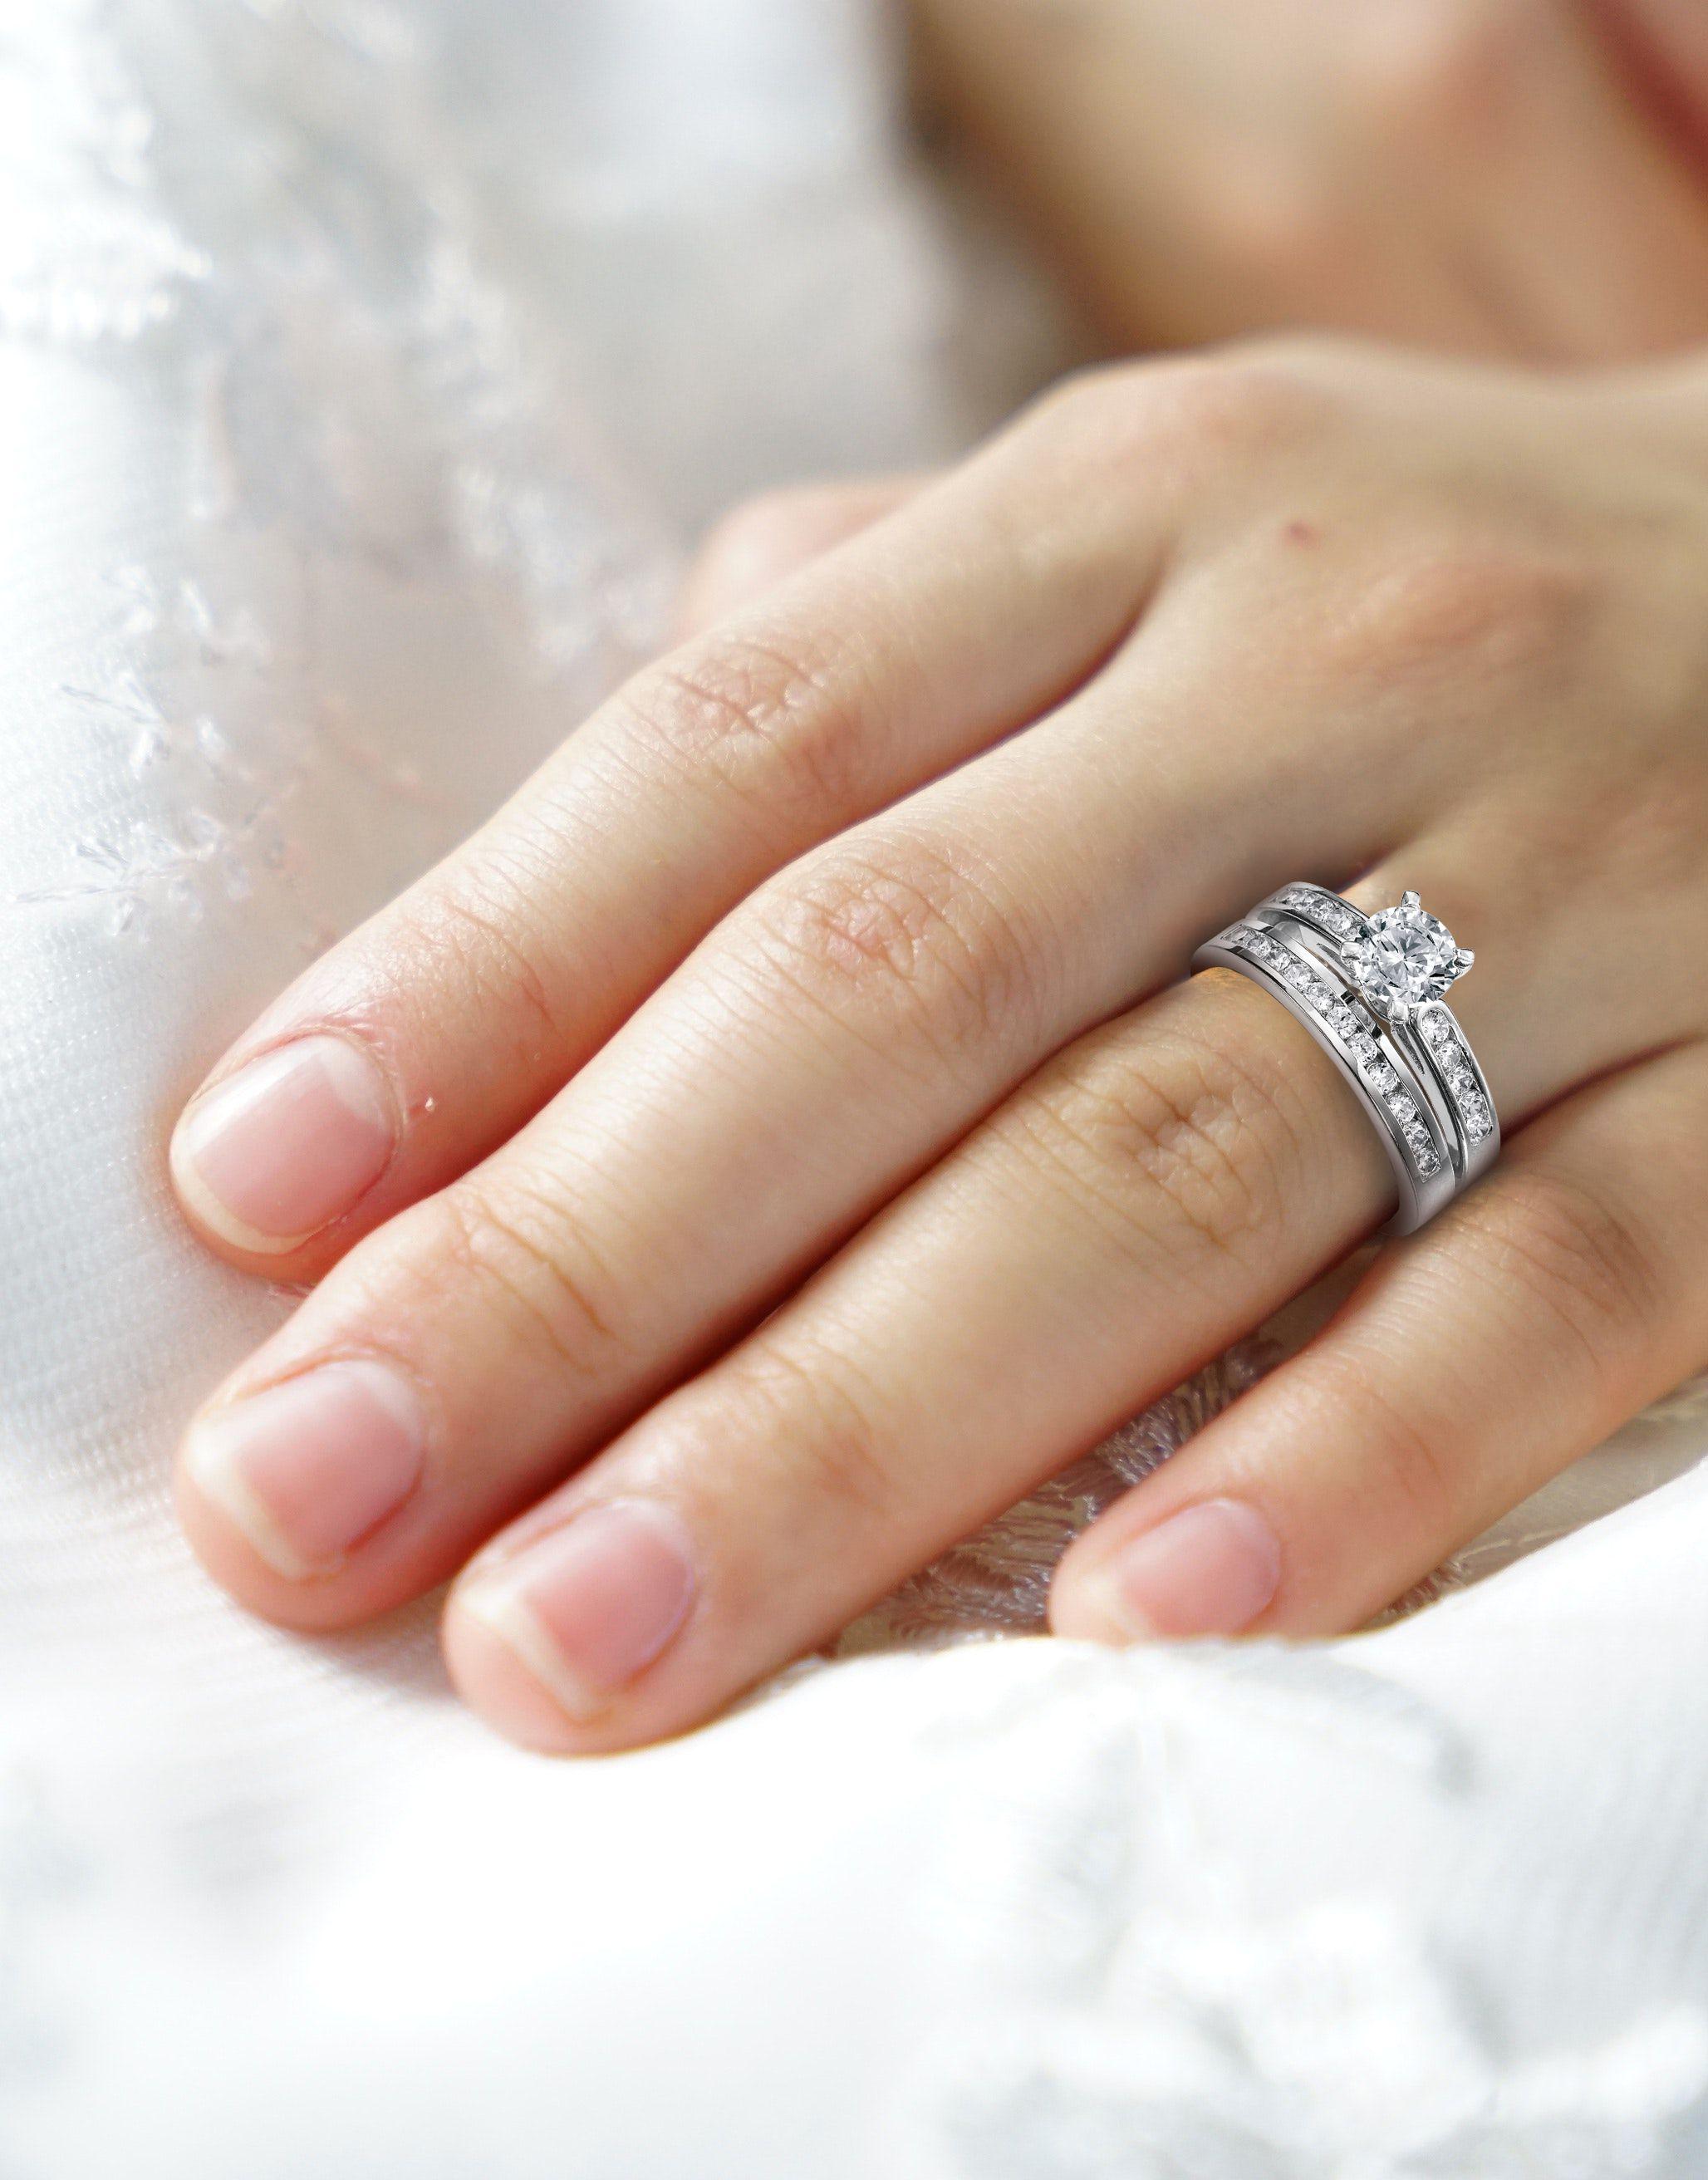 Carrie's Black Diamond Engagement Ring Patricia Field Artfashion